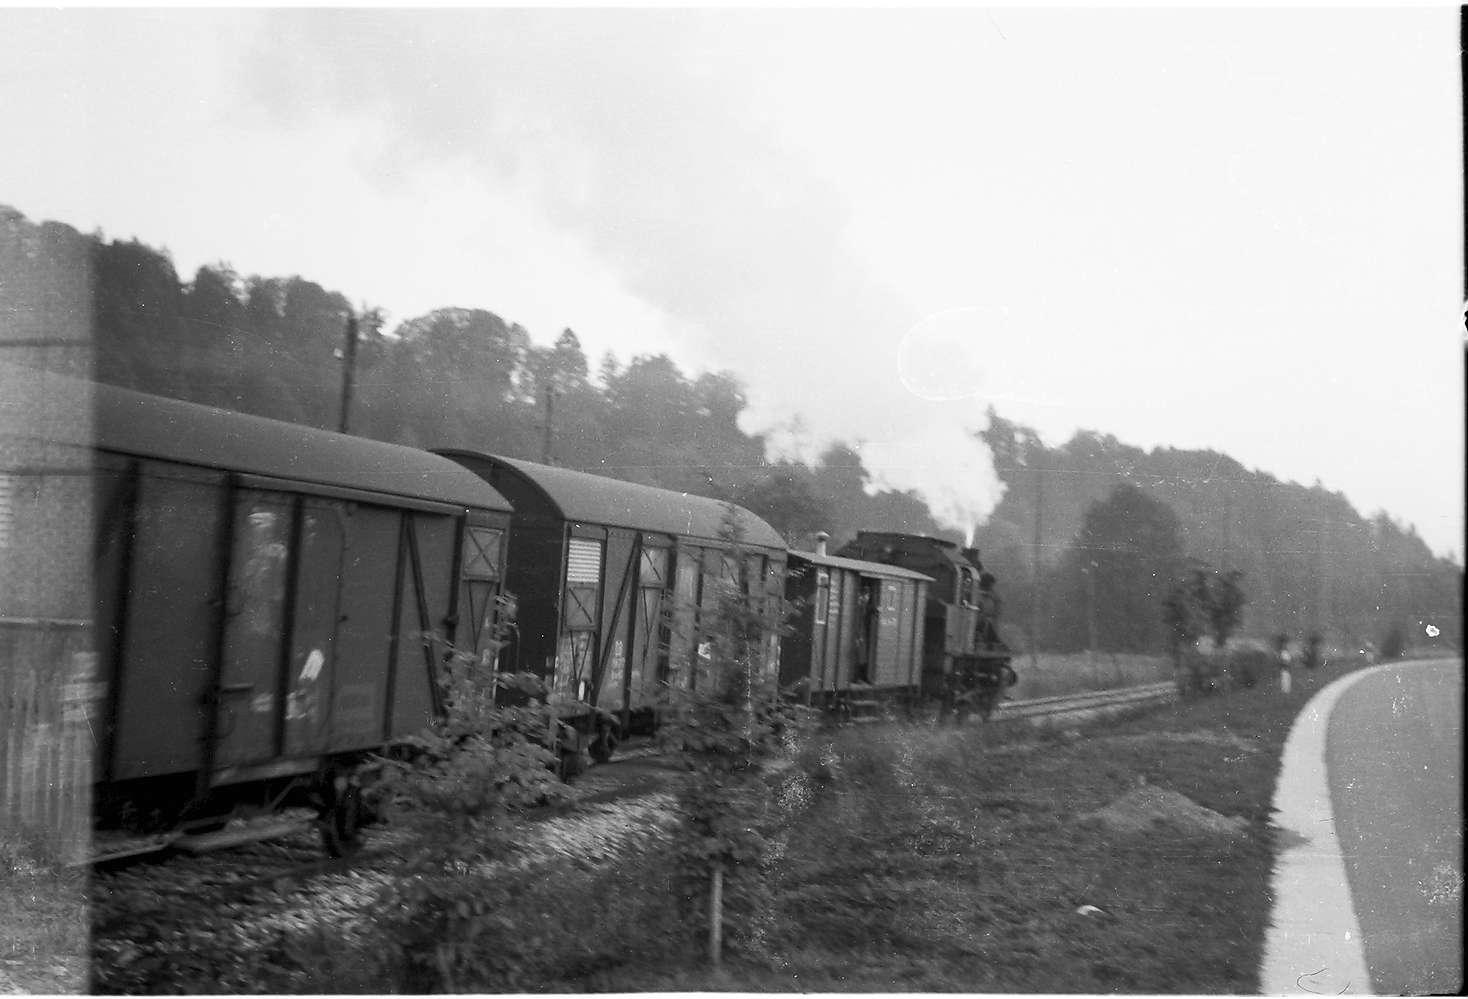 Lok 141, Strecke Laucherthal - Sigmaringendorf, Bild 1